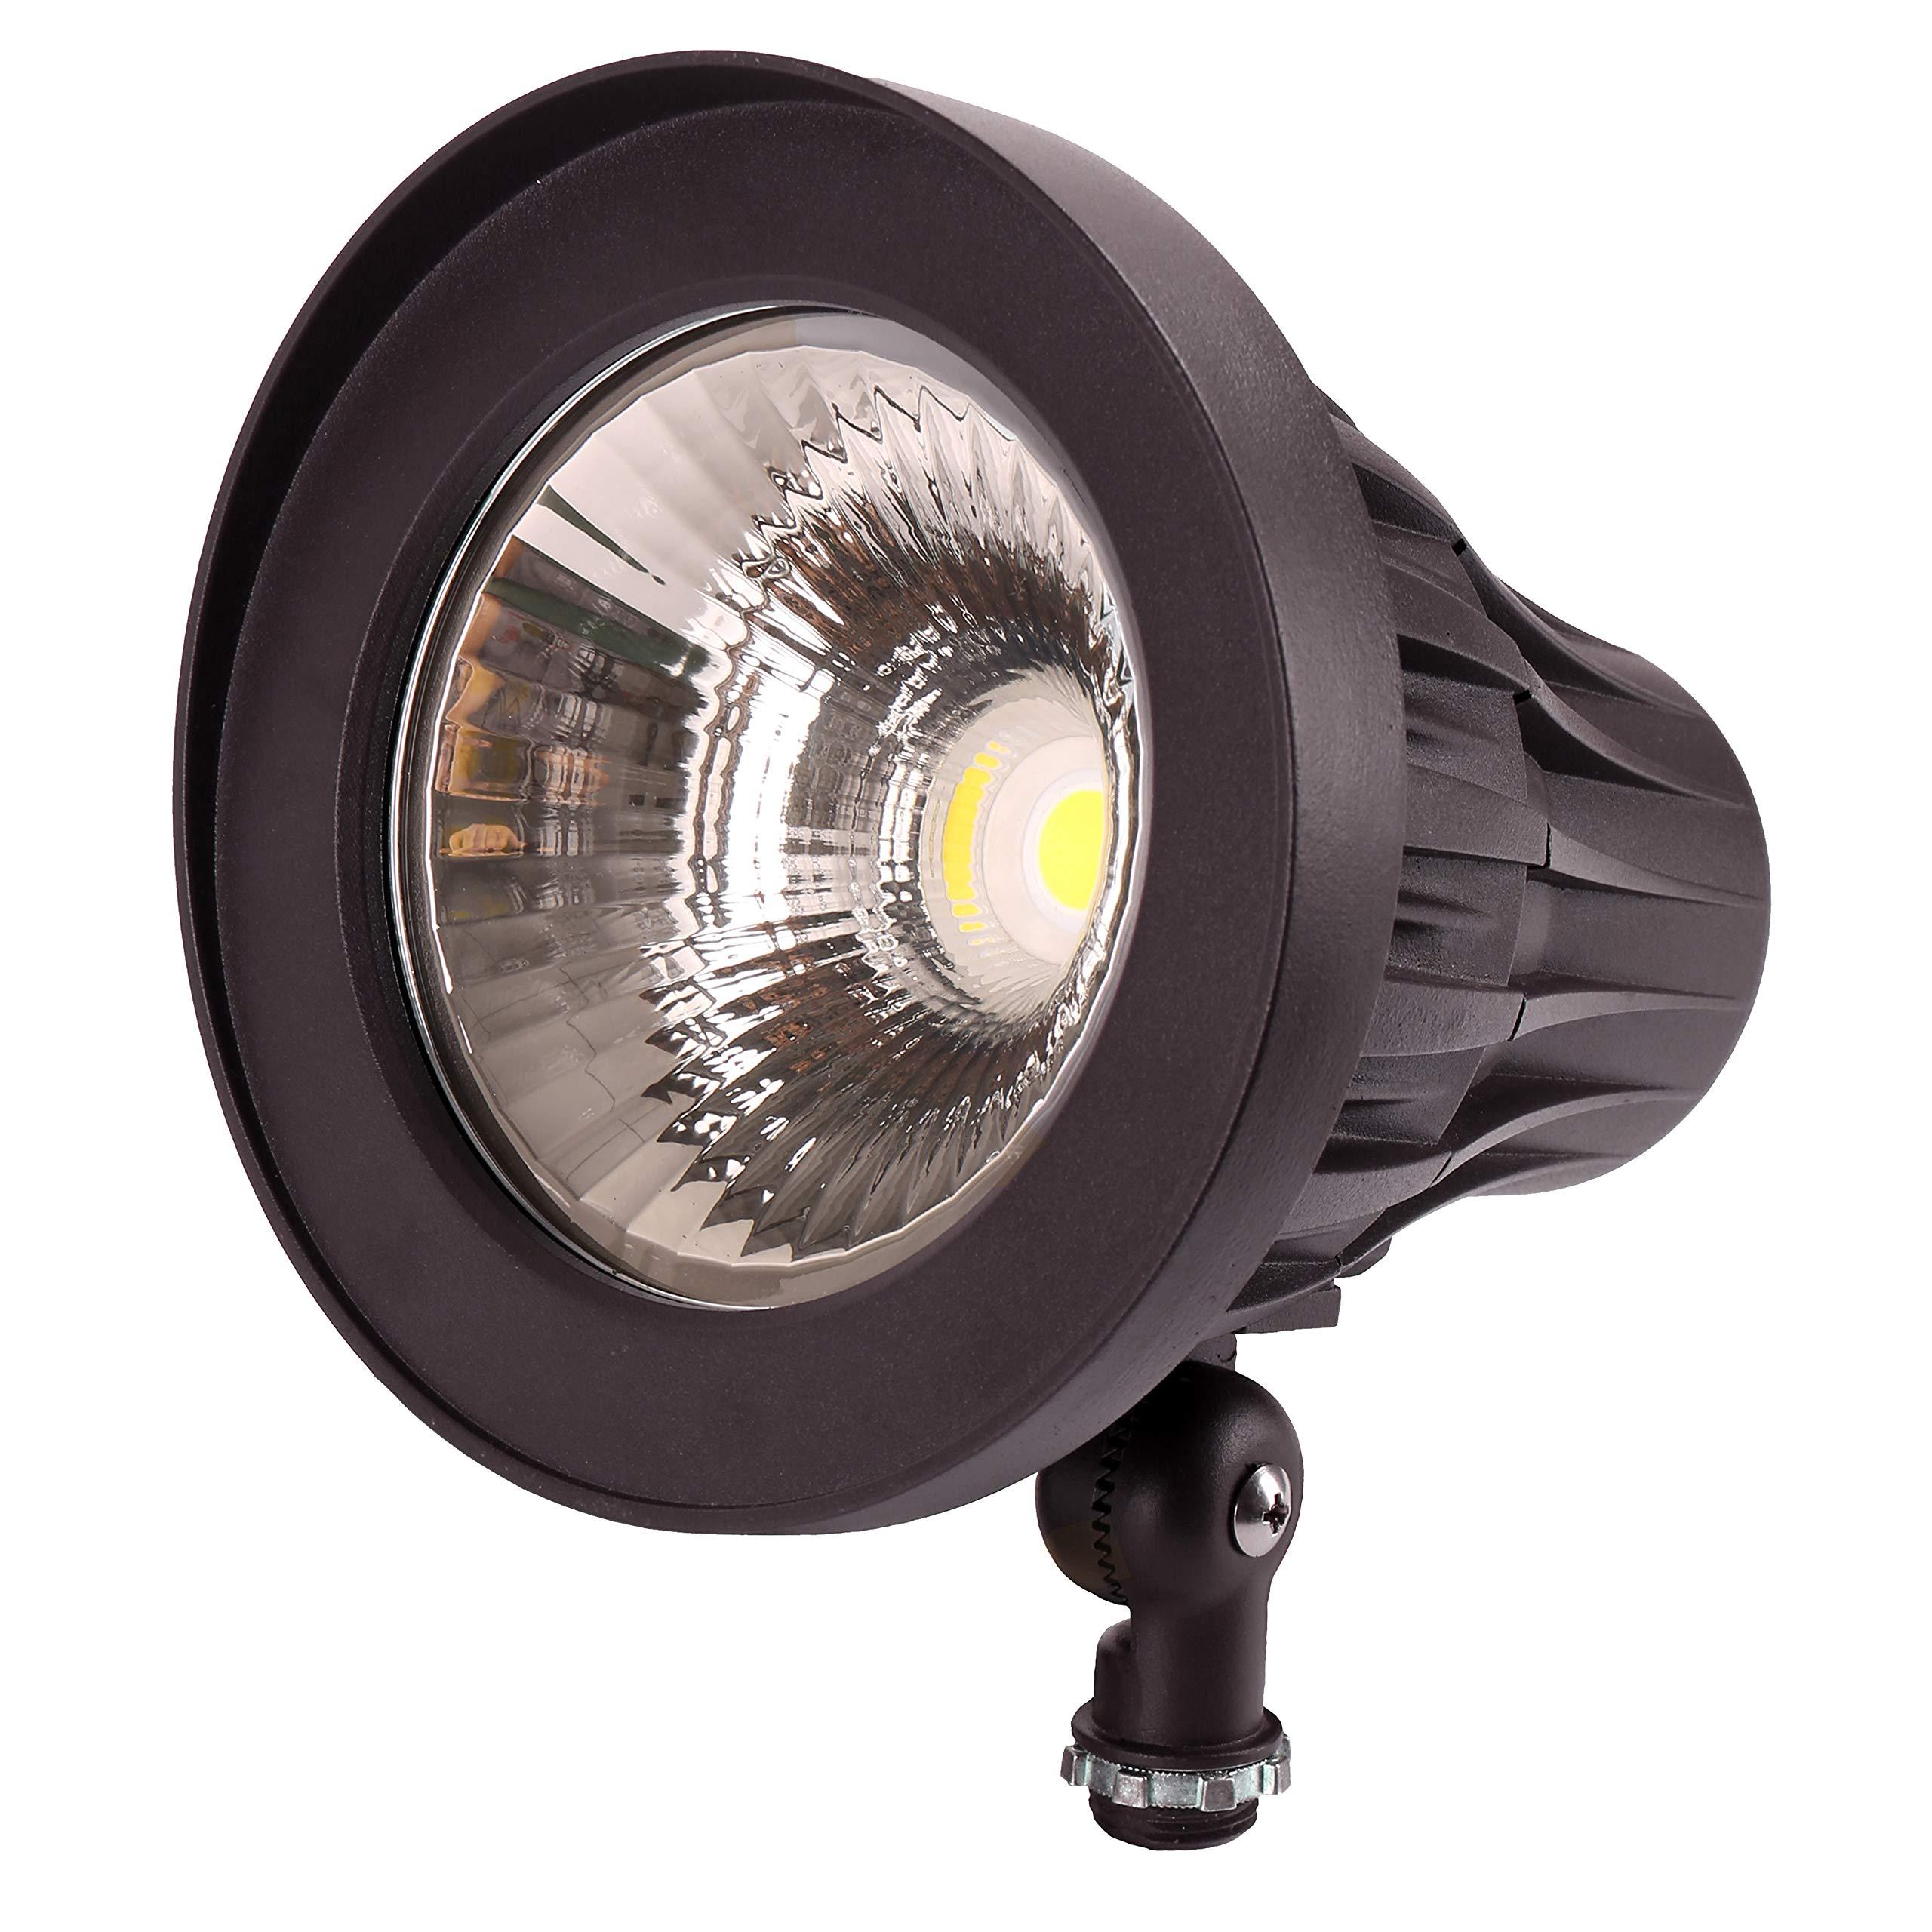 GKOLED 20W Bullet/Round Outdoor Spotlight, Narrow Beam Angle Light, 2500 Lumens Aluminum Waterproof Flag Pole Light, 5000K Daylight White, 120-277V AC, UL Listed and DLC Qualified, 5 Years Warranty